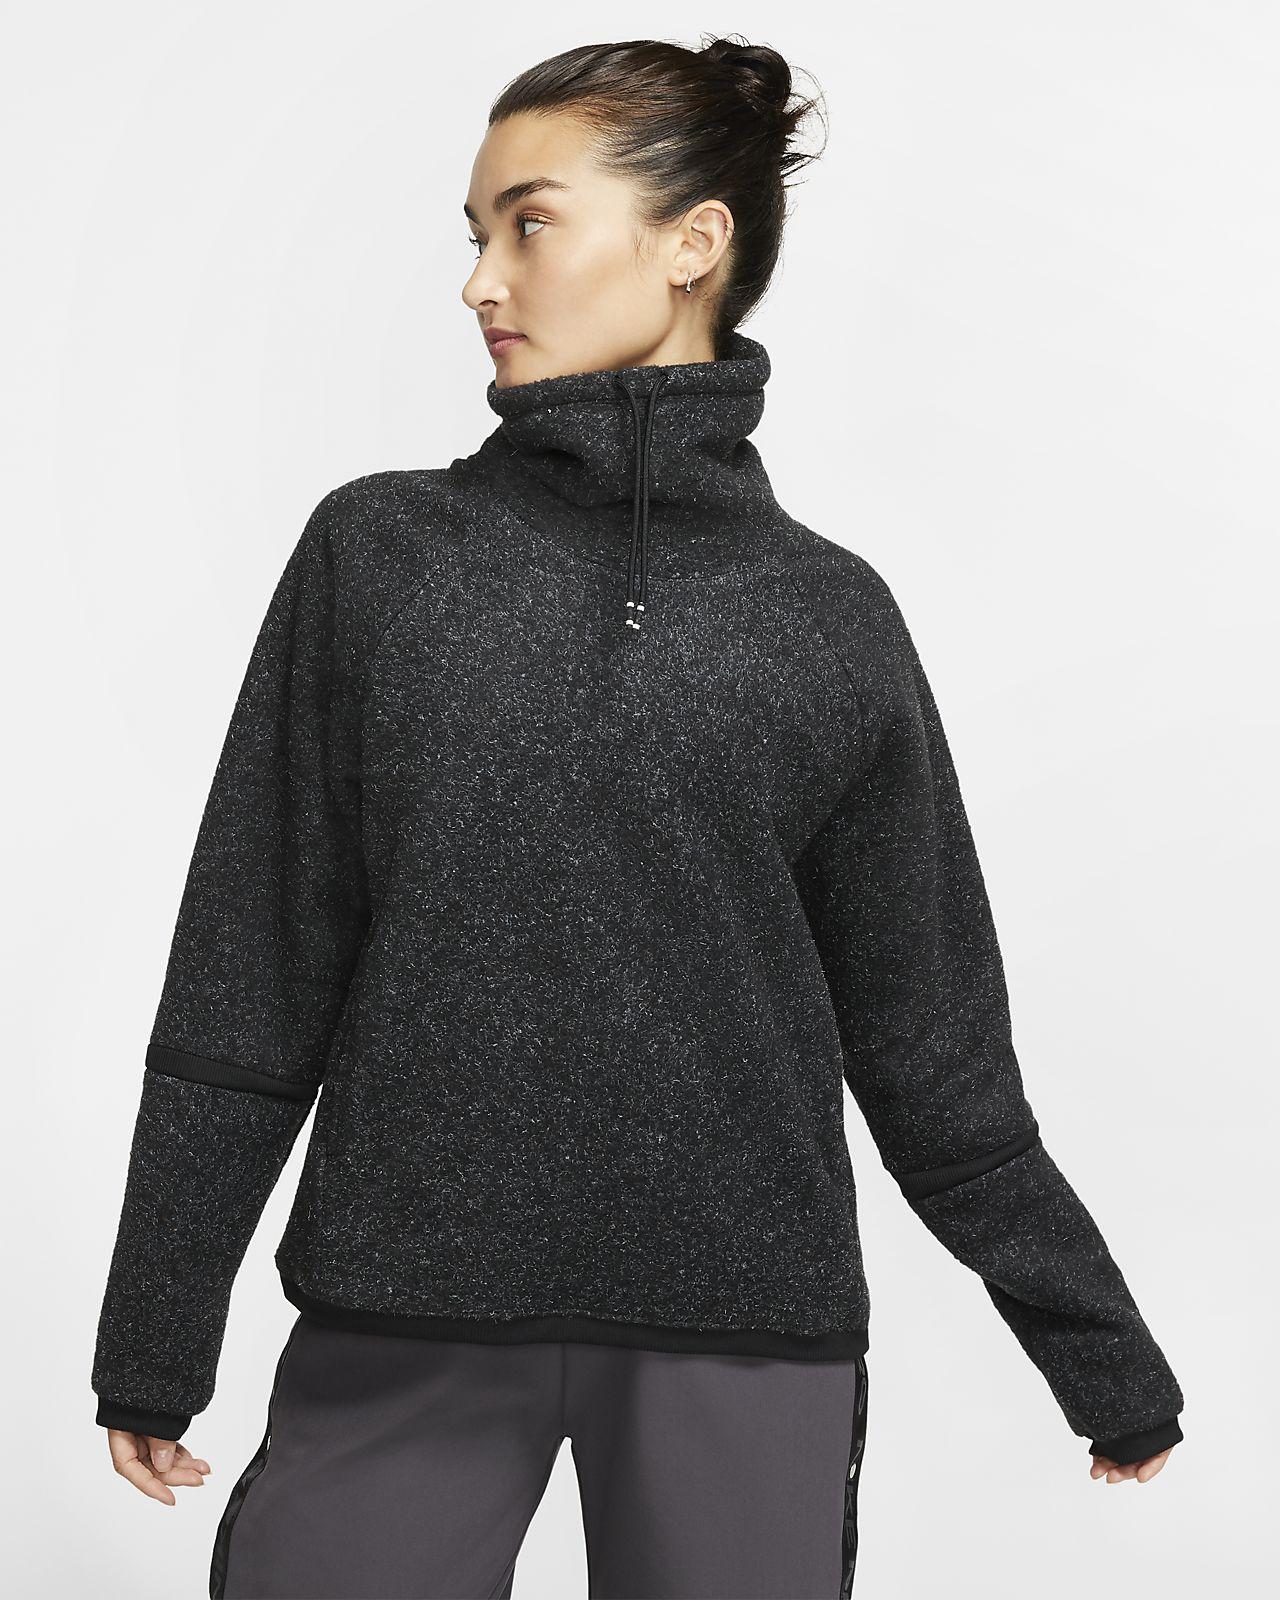 Nike Therma Women's Long-Sleeve Fleece Training Top